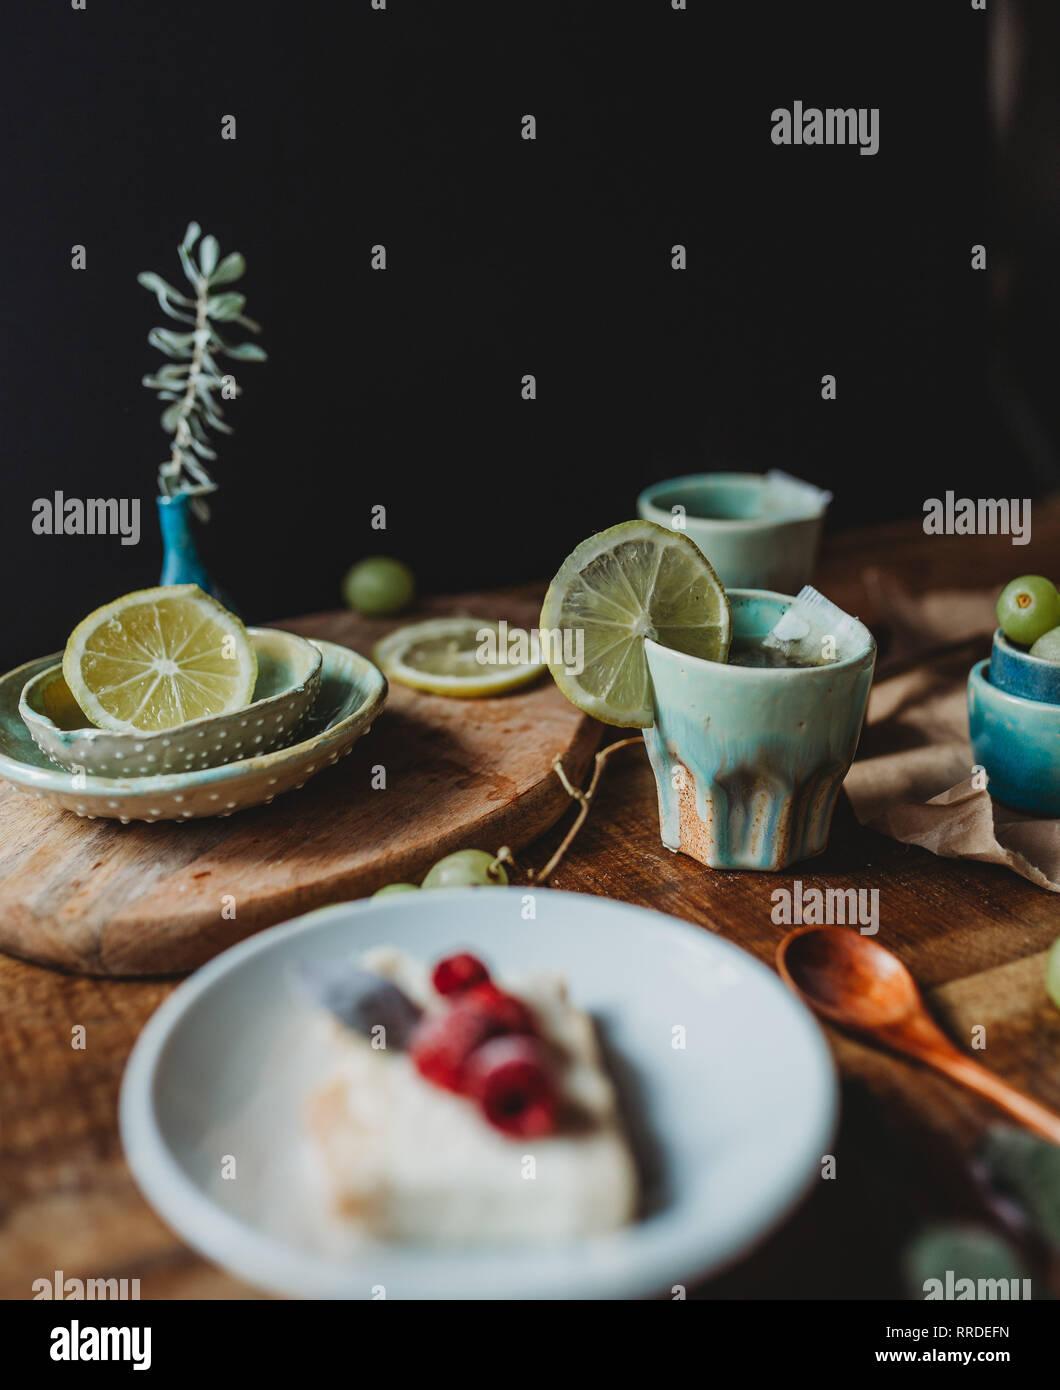 Arrangement of ceramic utensil on wood table - Stock Image